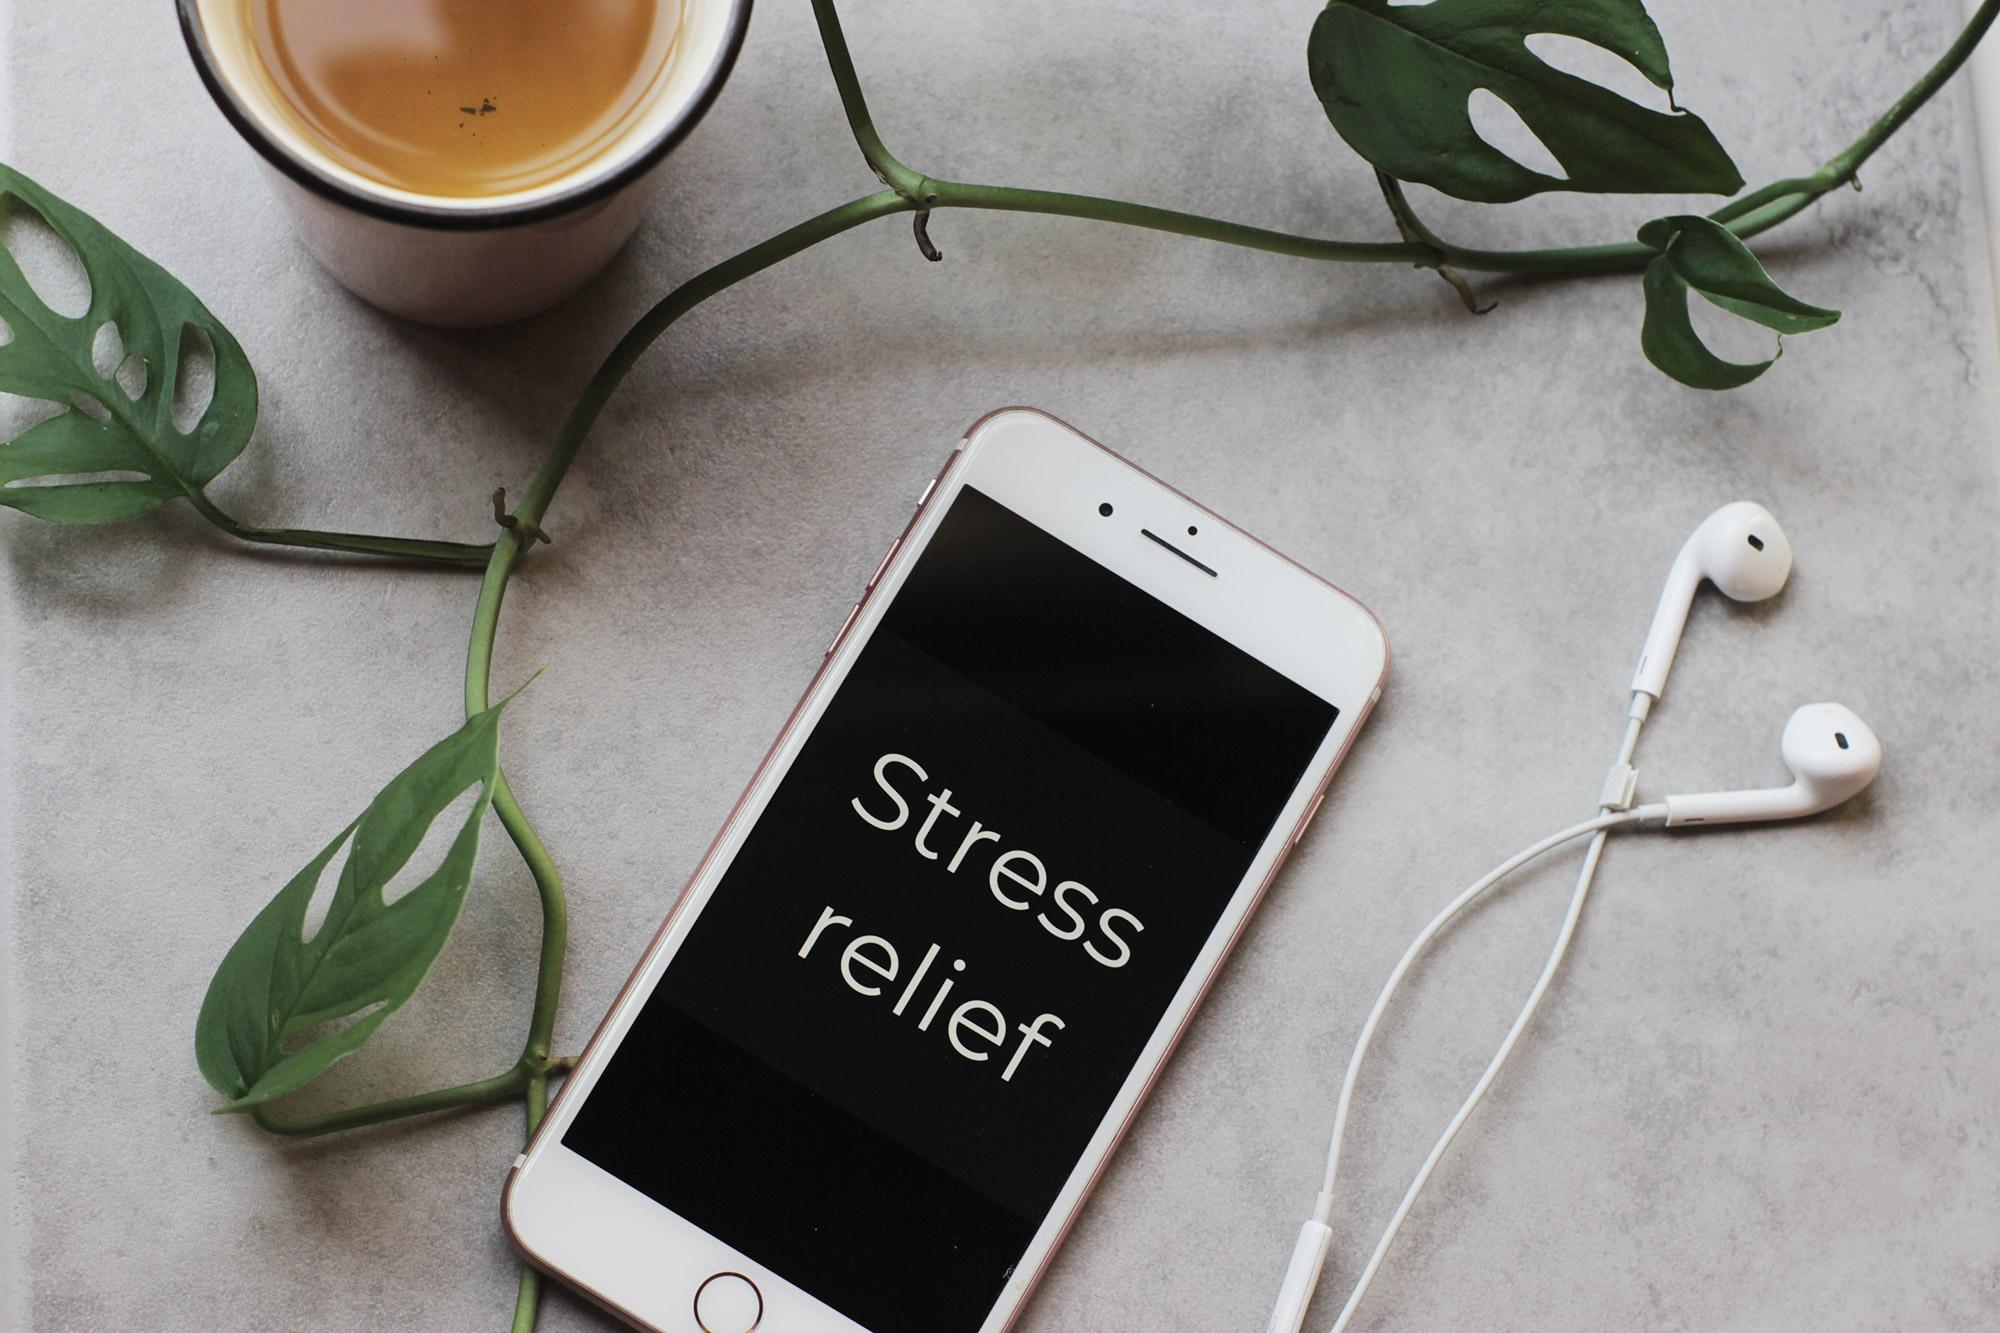 Stress Management & Lifestyle Advice